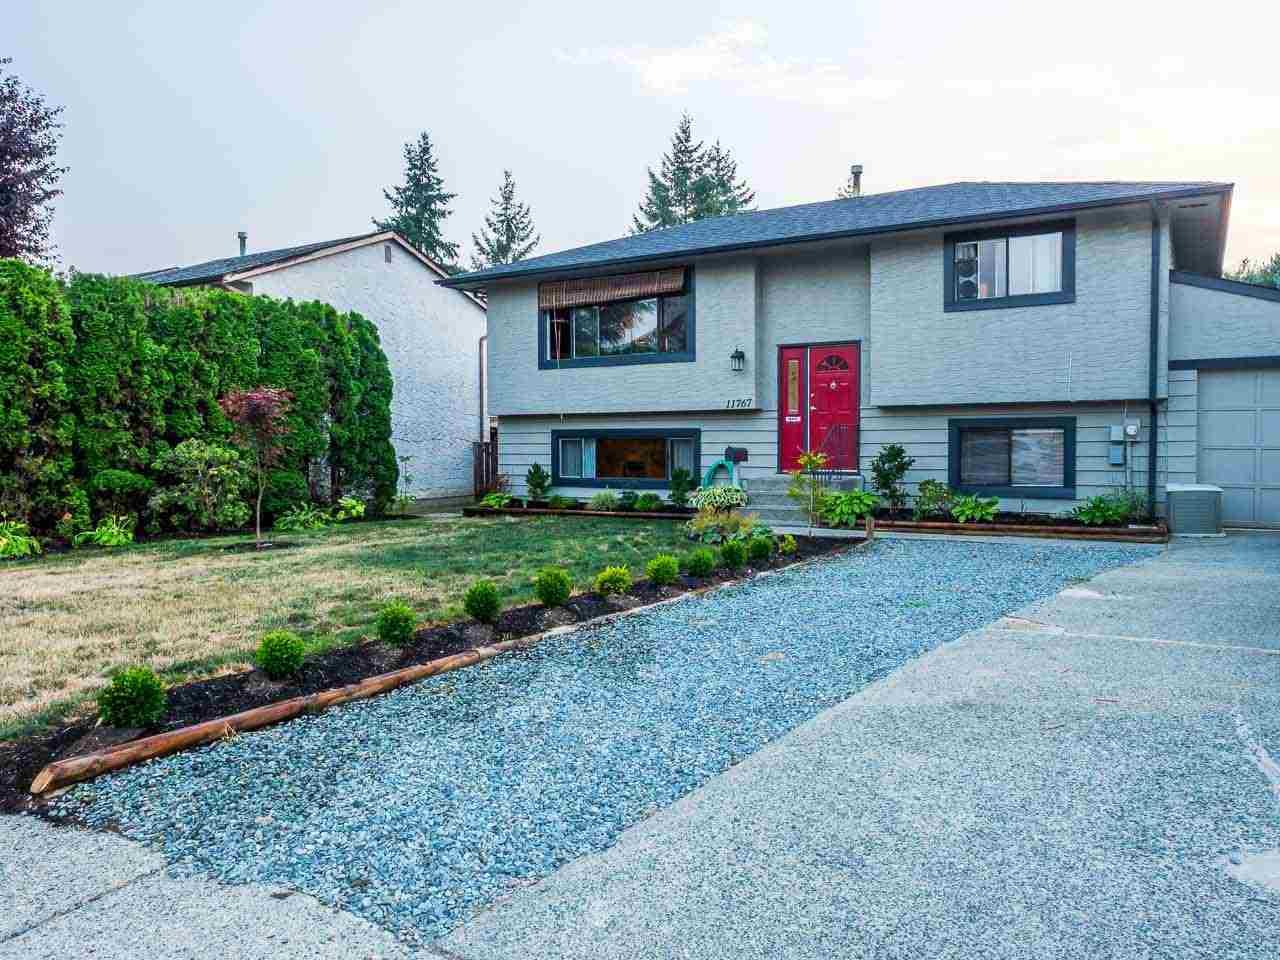 Detached at 11767 230 STREET, Maple Ridge, British Columbia. Image 1